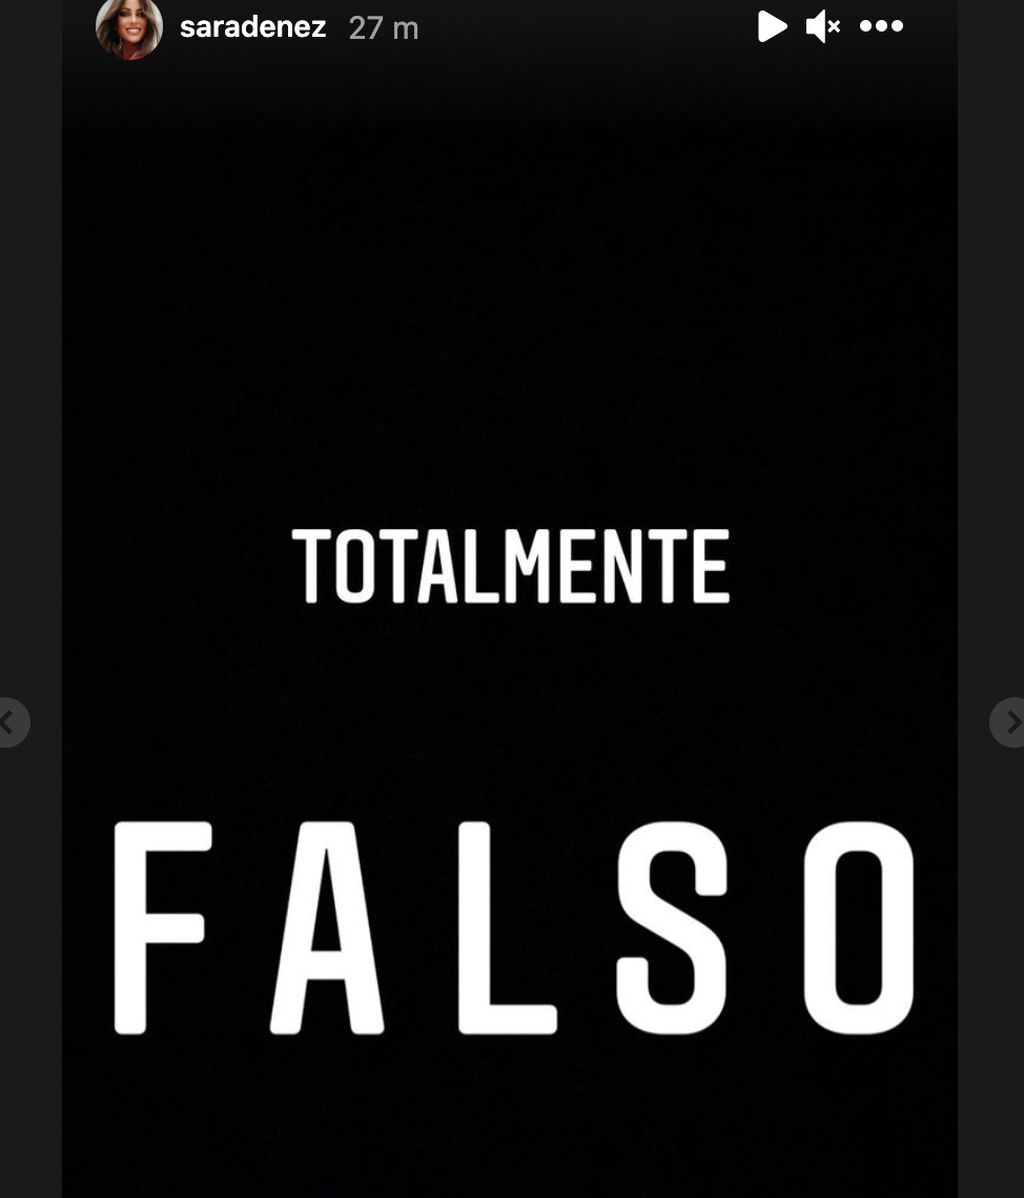 Desmentido Iker Casillas